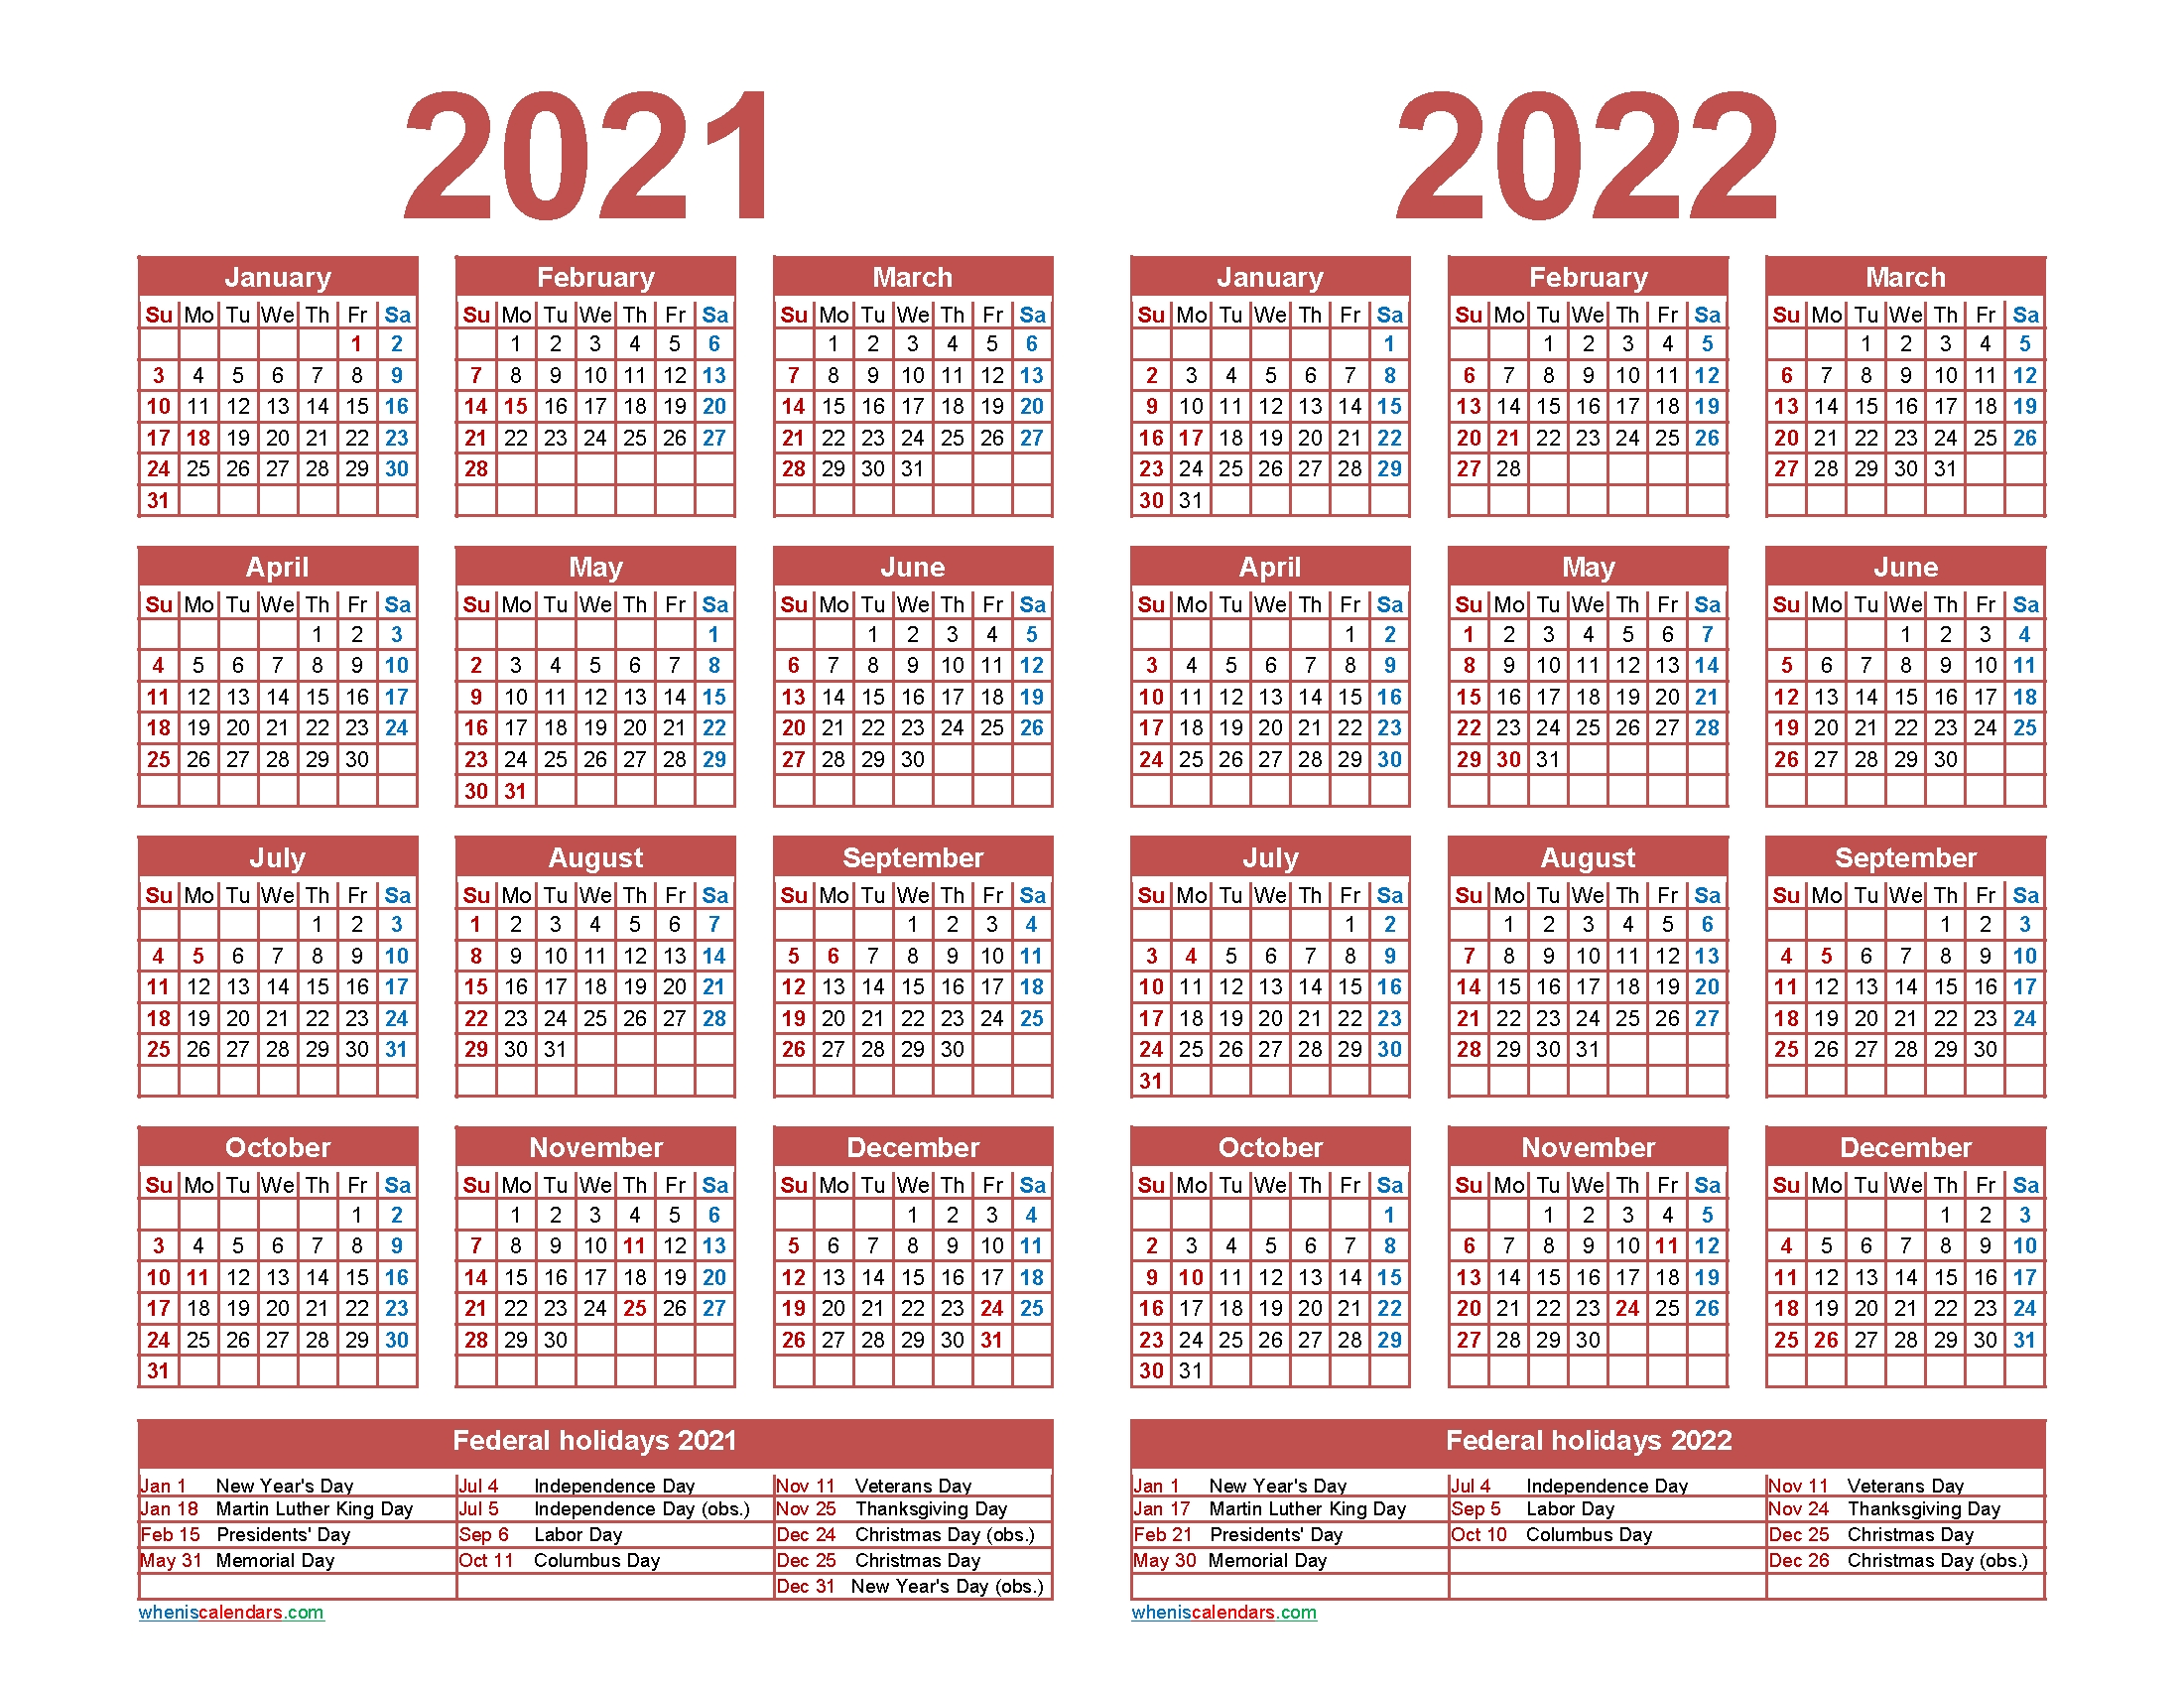 2021 And 2022 Calendar Printable With Holidays | Free